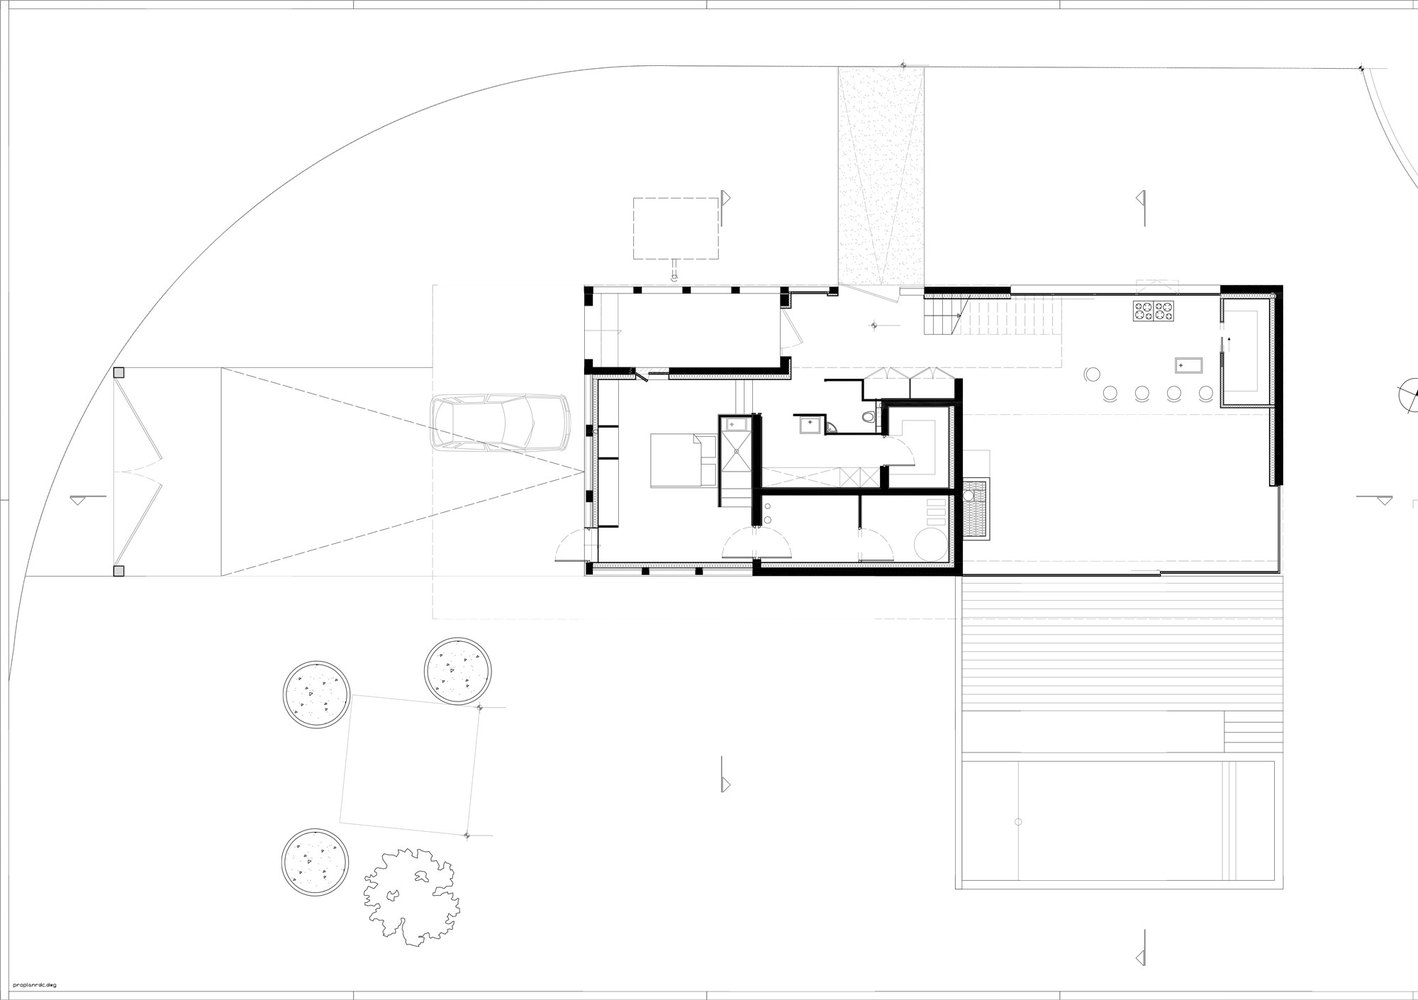 hight resolution of chipster blister house ground floor plan